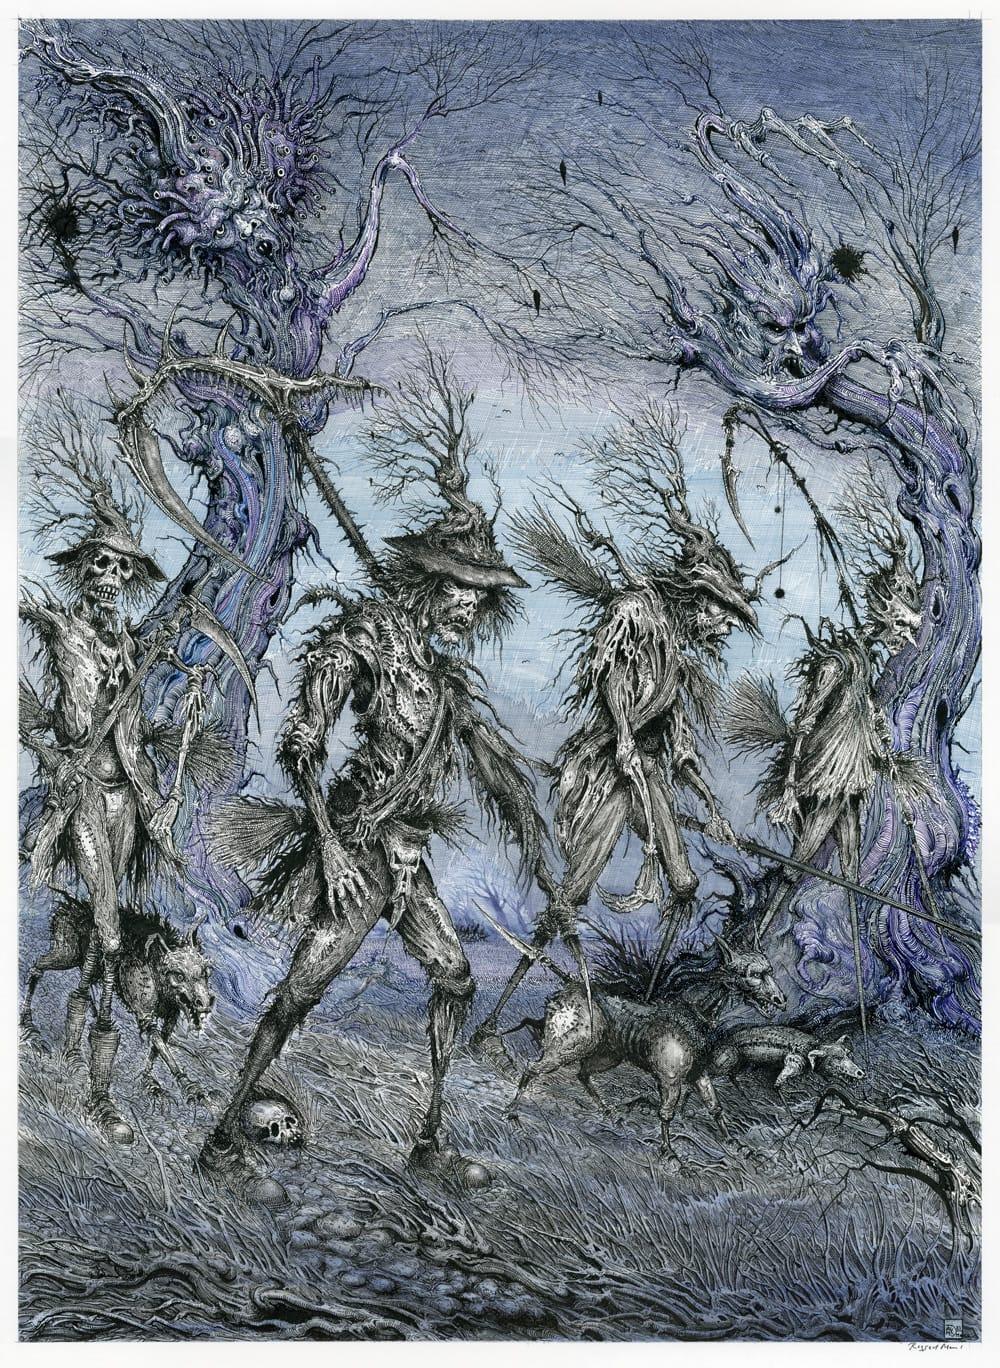 Ragged Men Pen and ink on illustration board 43.8cm x 60cm (2021) £2,000.00